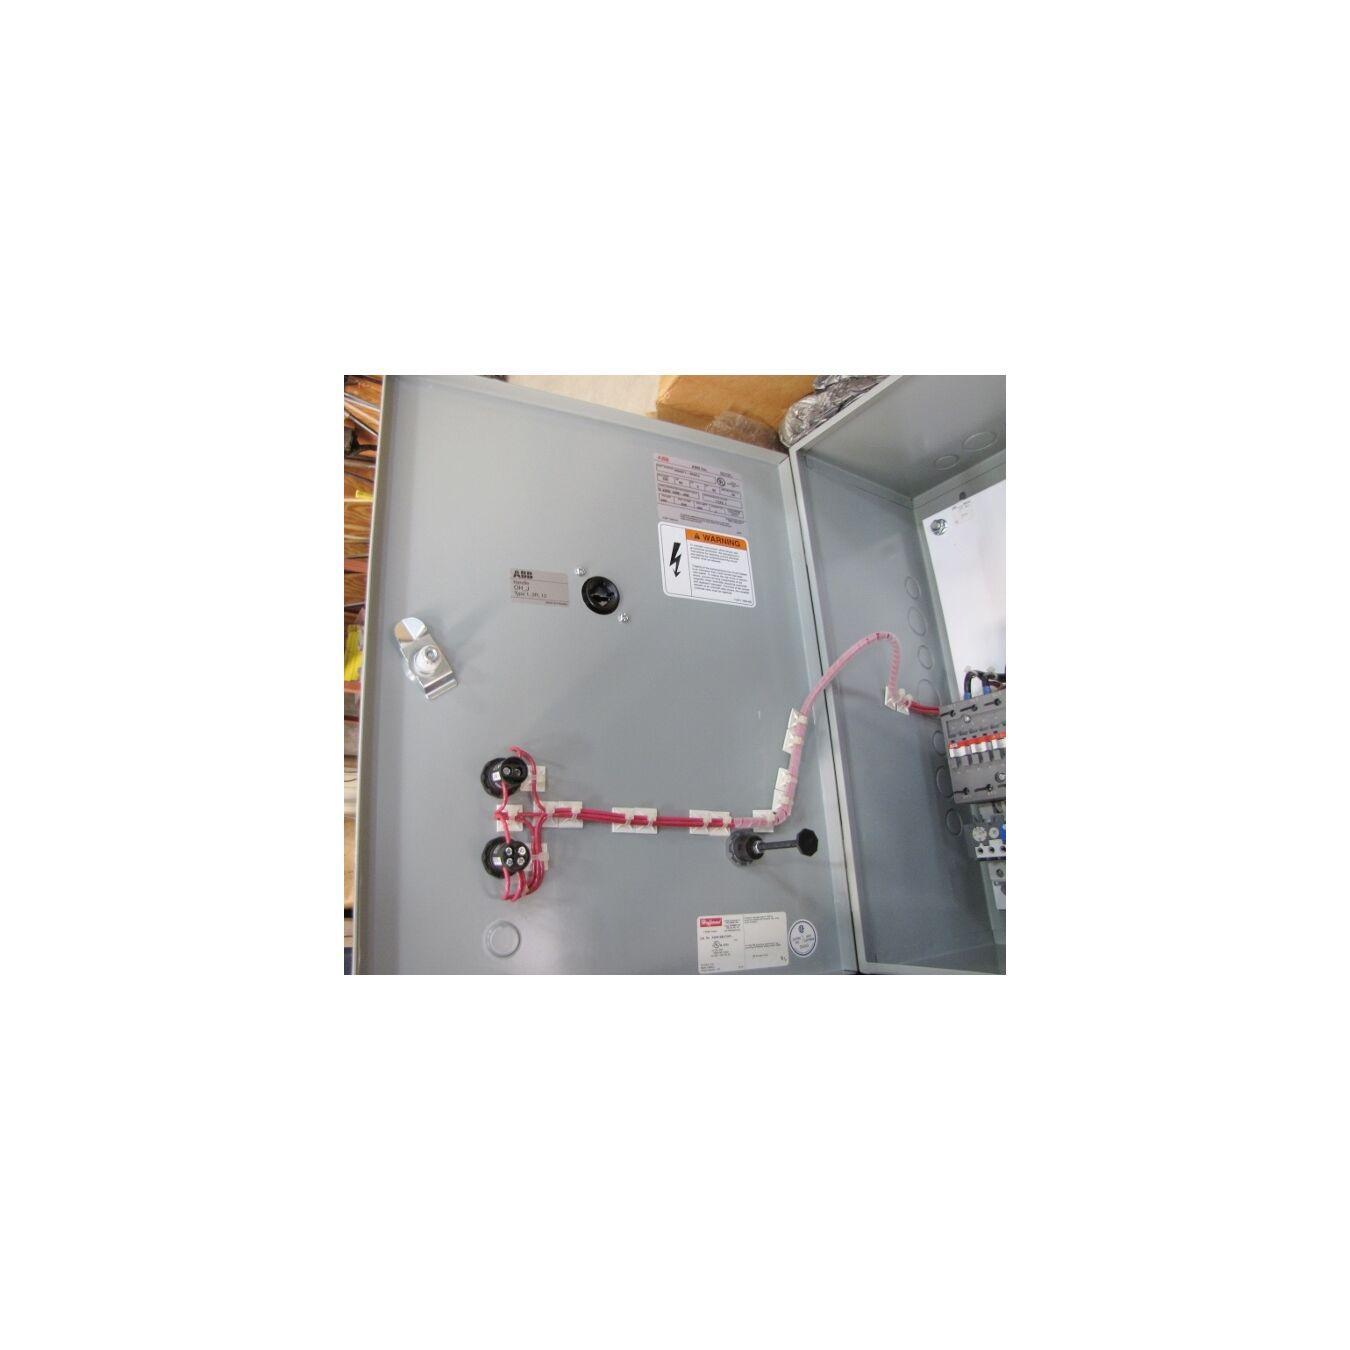 Unused Abb 30 Hp Motor Starter Electrical Equipment